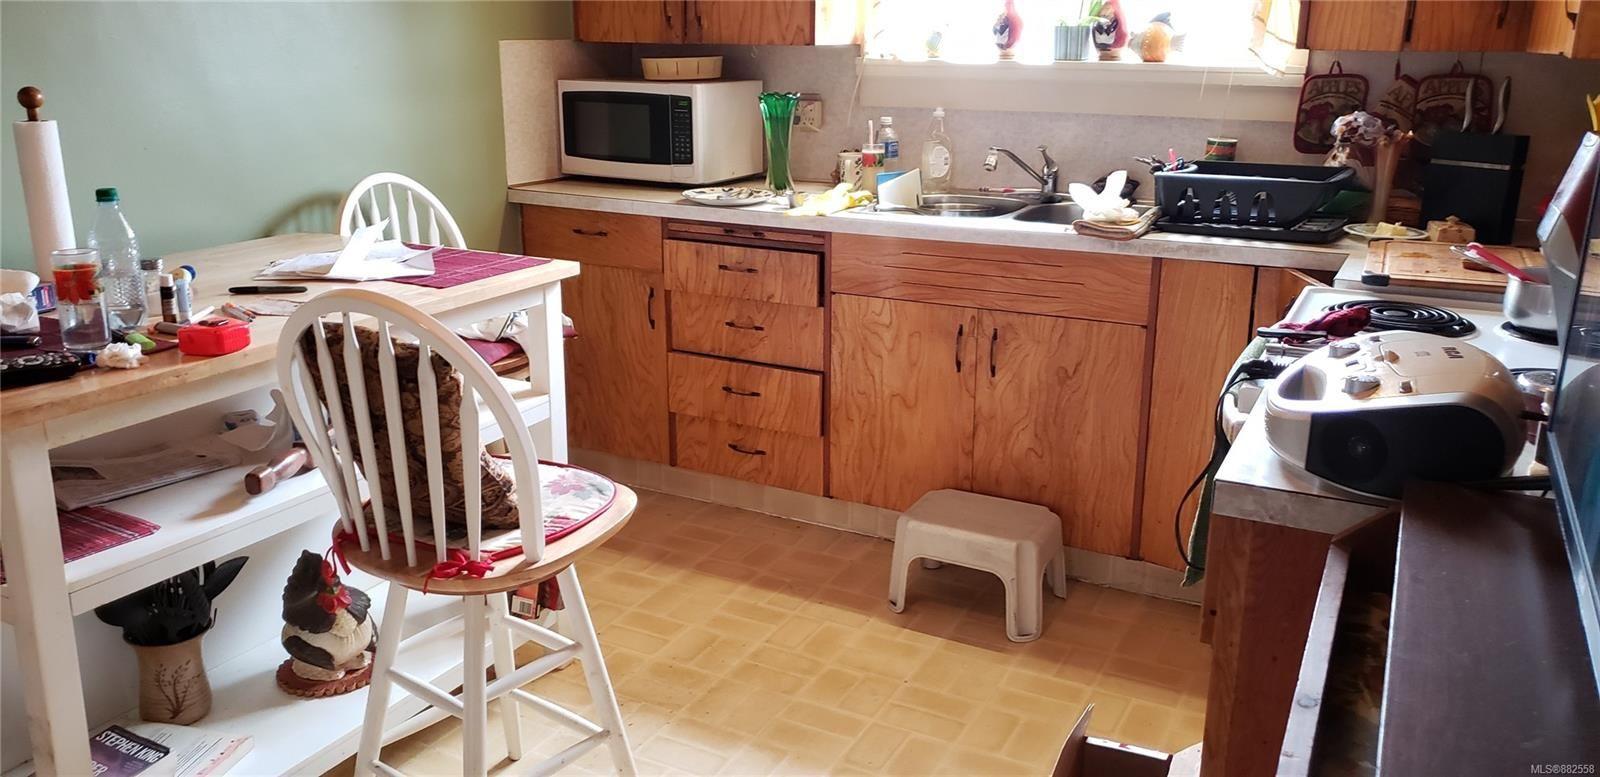 Photo 4: Photos: 2686 6th Ave in : PA Port Alberni House for sale (Port Alberni)  : MLS®# 882558